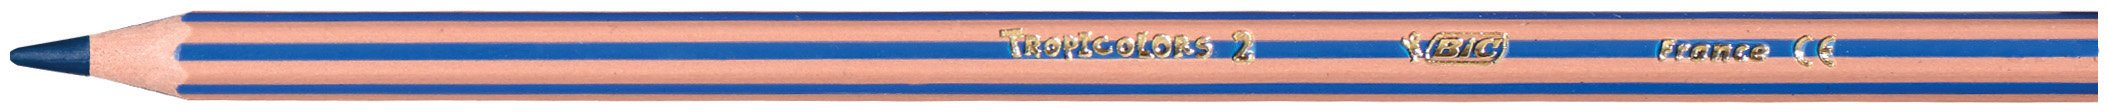 BIC KiDS lápices de colores Tropicolors 2, varios colores, estuche de cartón 12er Kartonetui